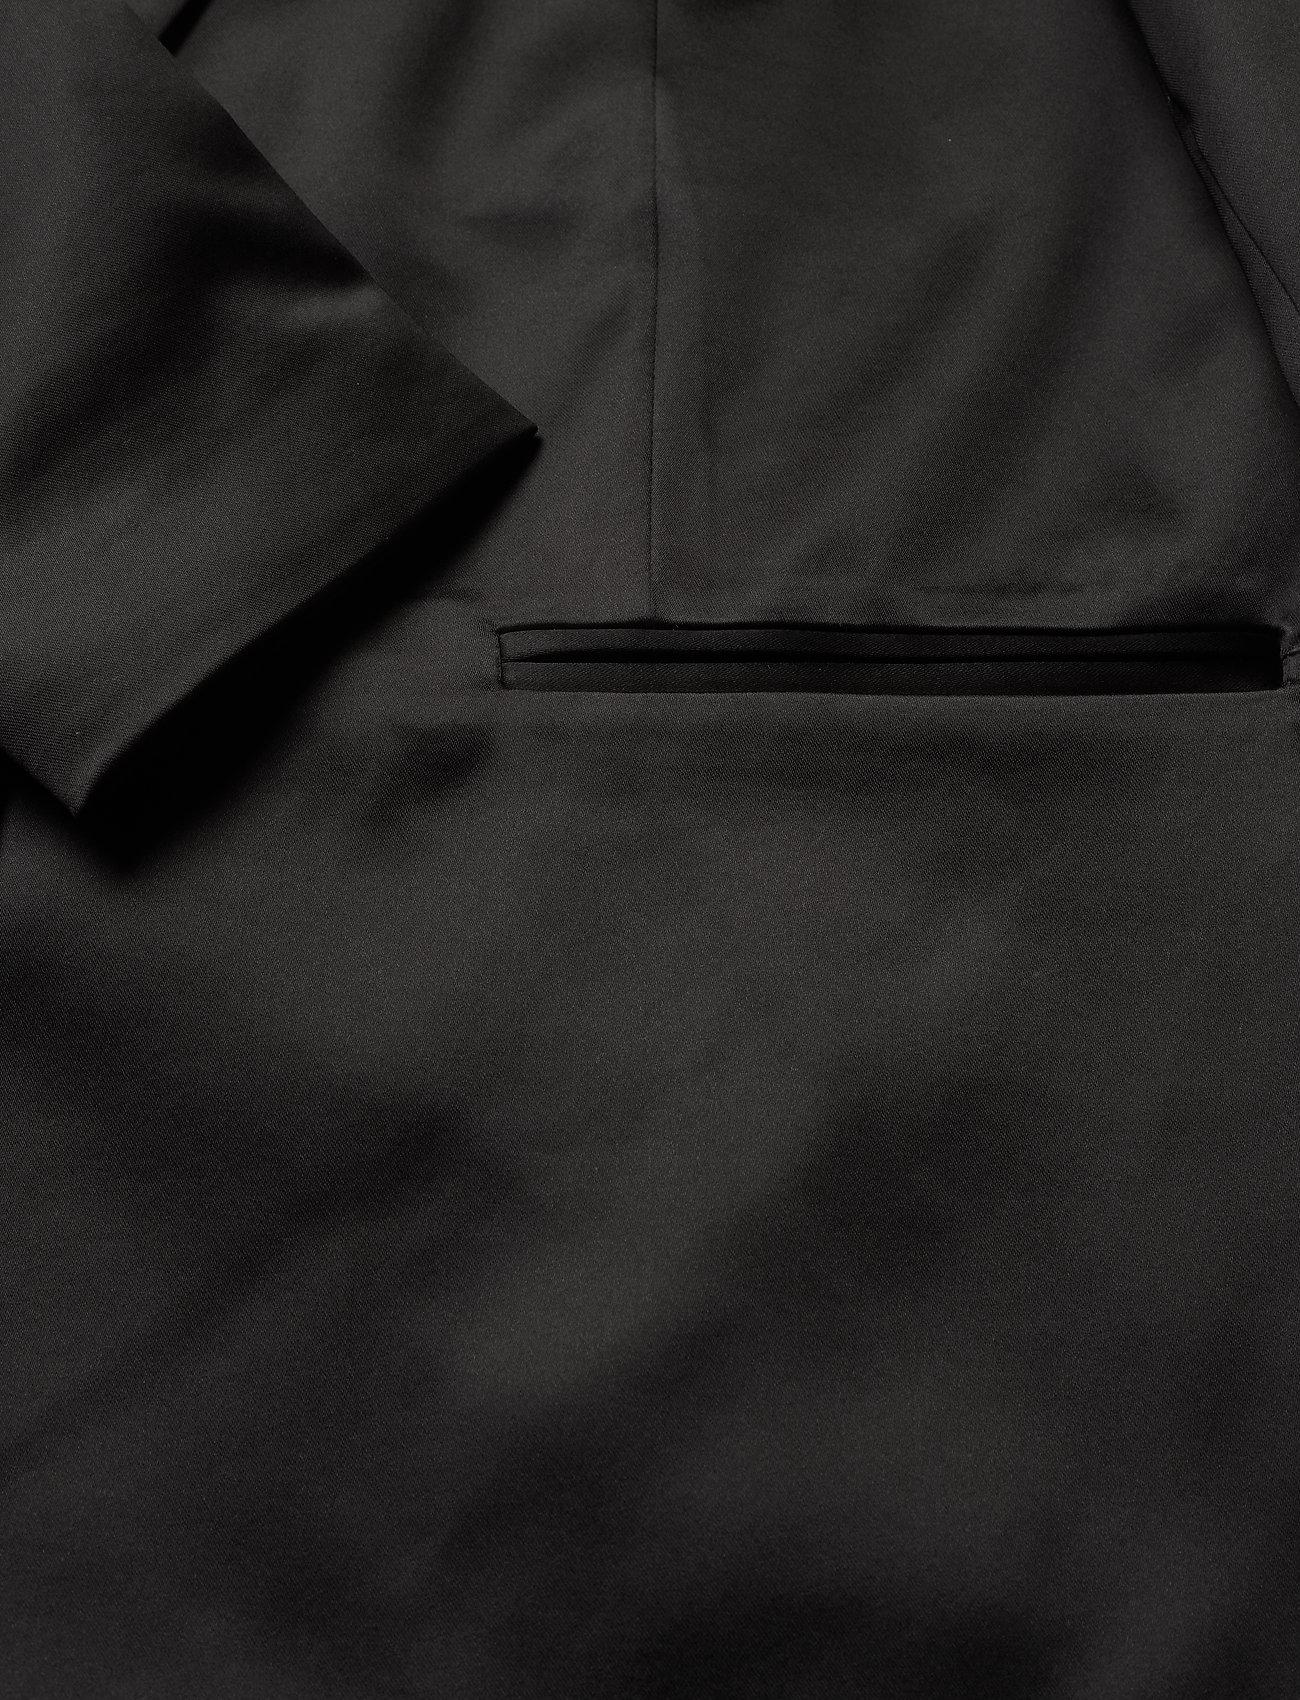 Custommade Hedvig - Blezery ANTHRACITE BLACK - Kobiety Odzież.